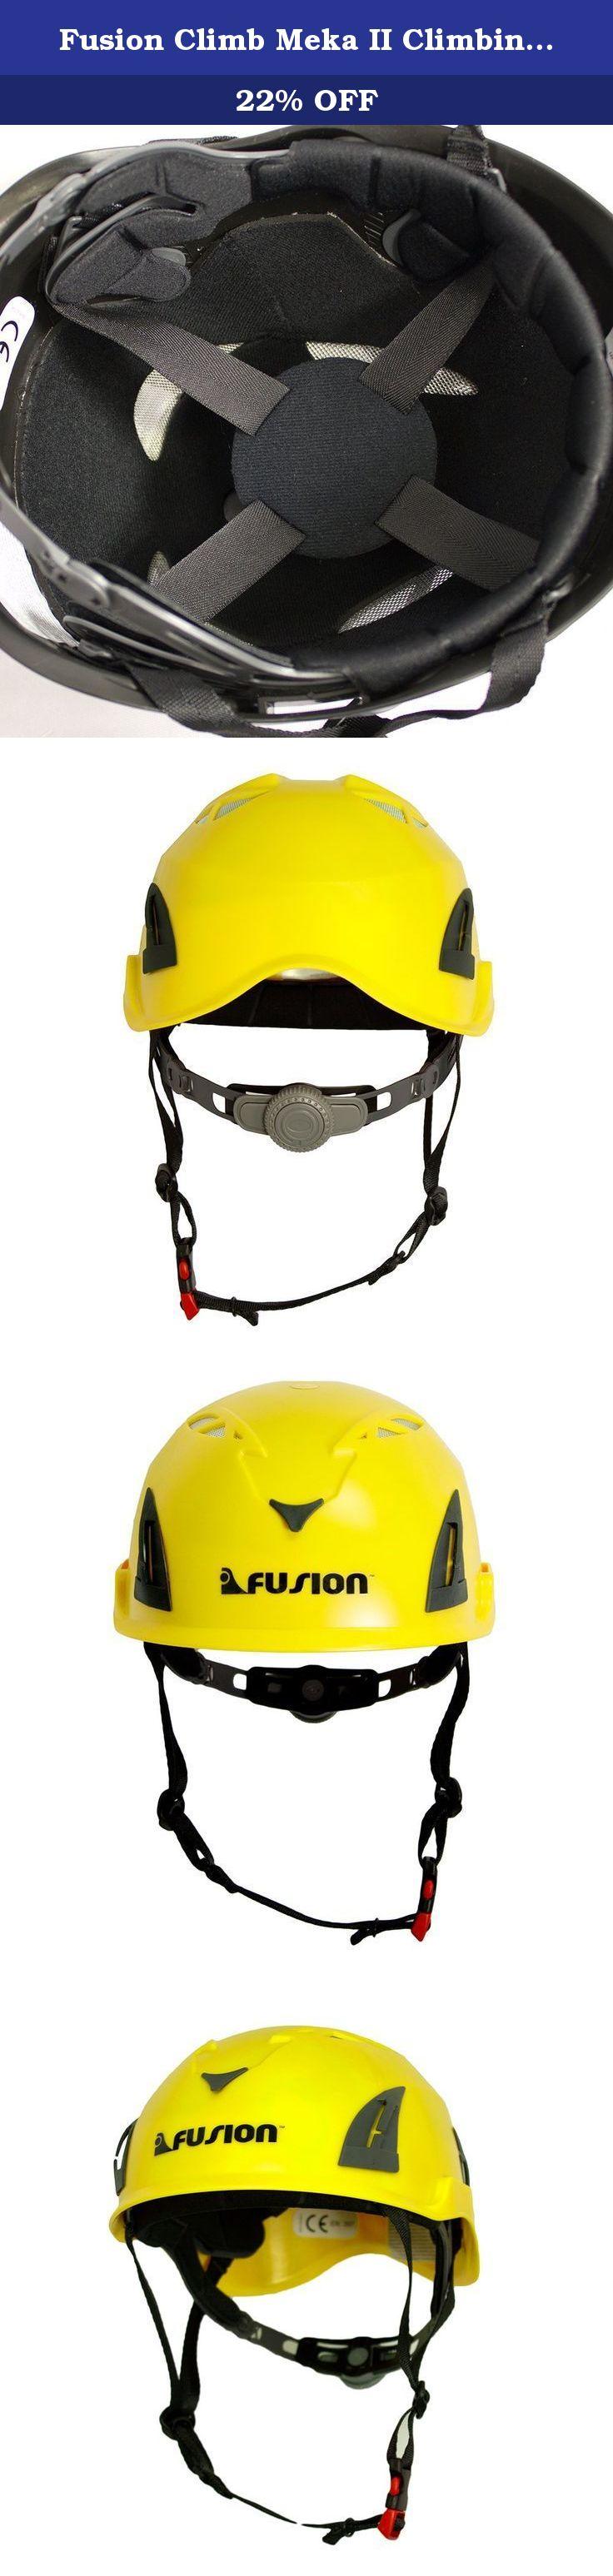 fusion climb meka ii climbing bungee zipline mountain safety